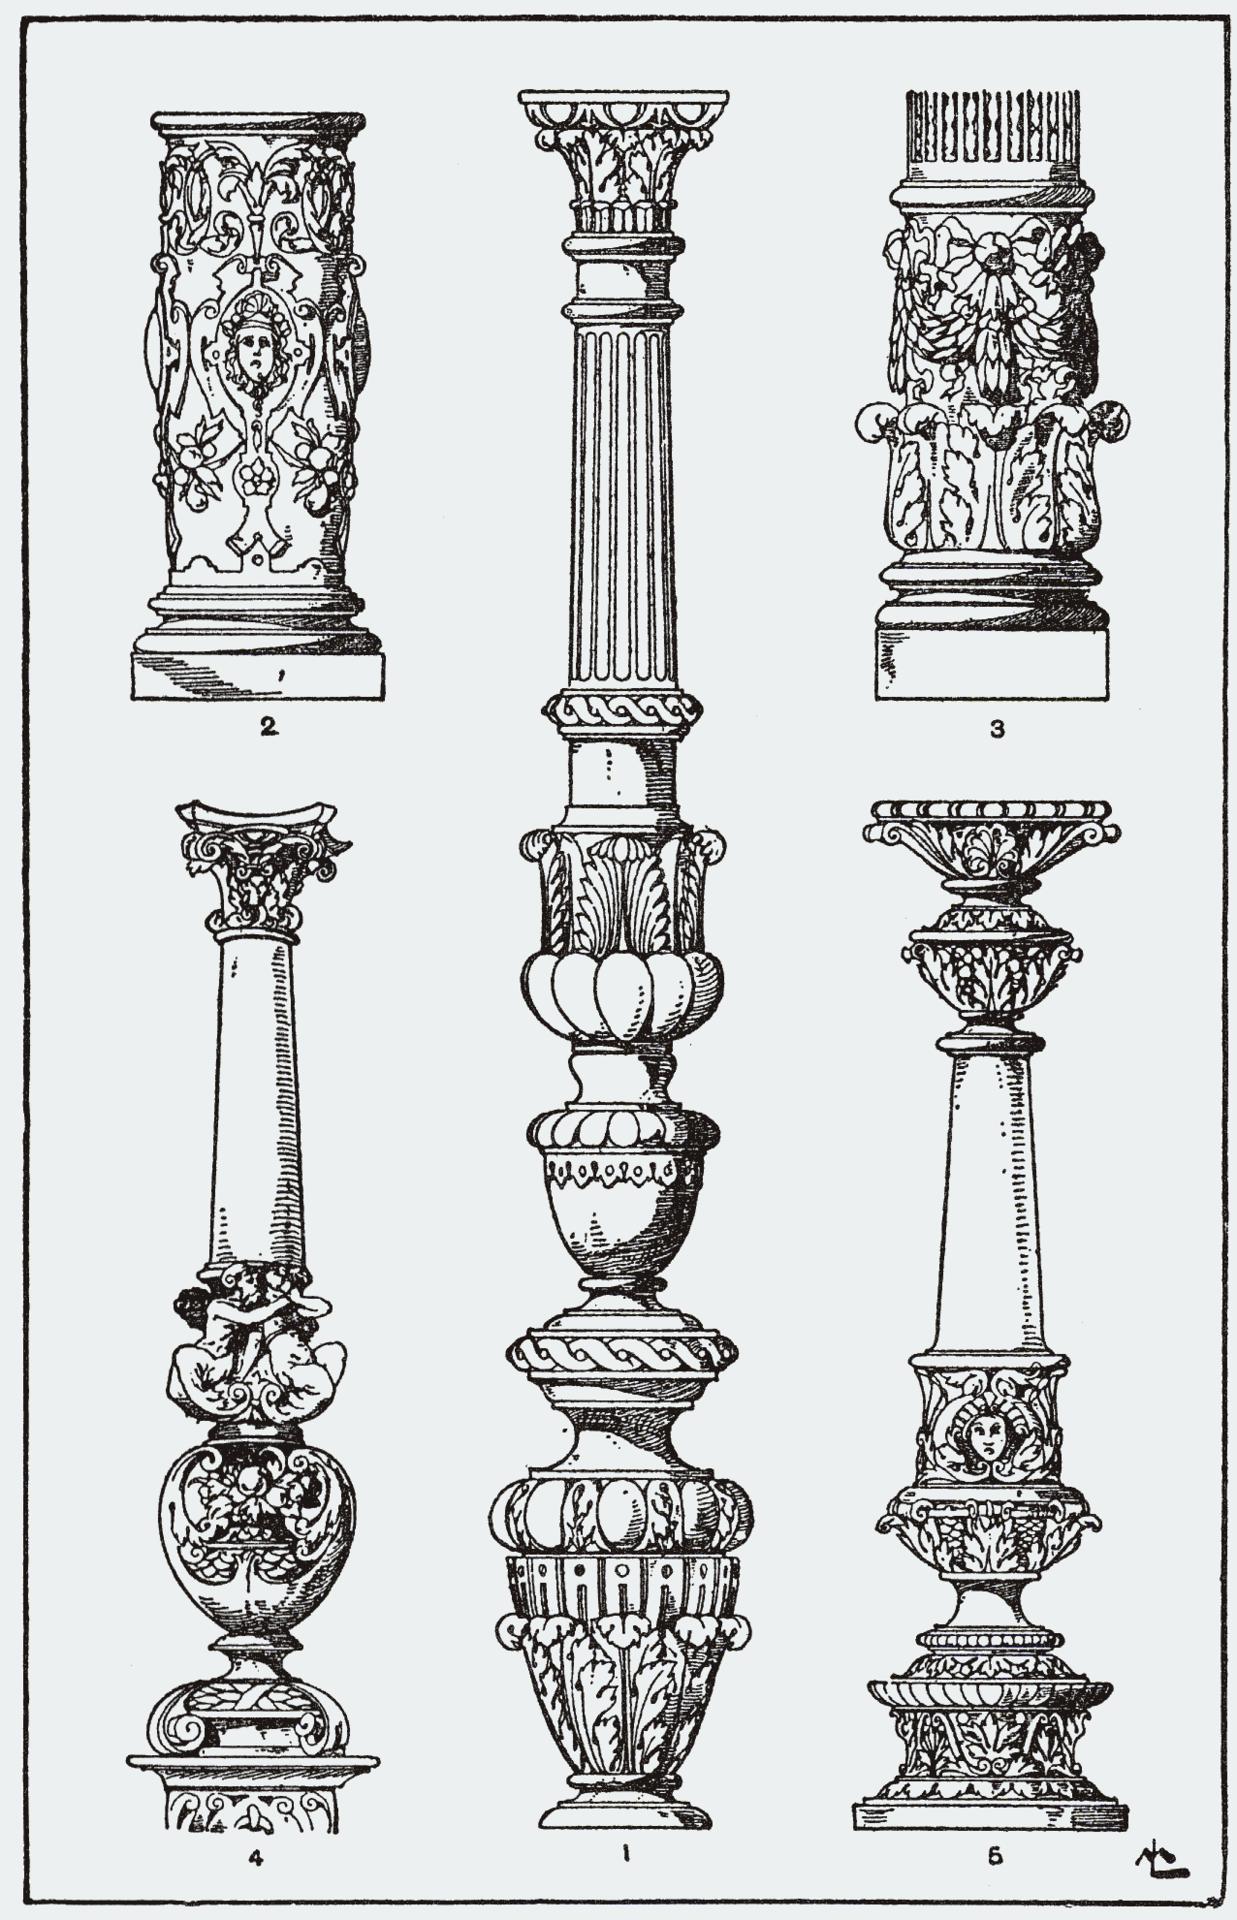 Category Meyer S Ornament Wikimedia Commons Temple Architecture Architecture Drawing Architecture Sketch